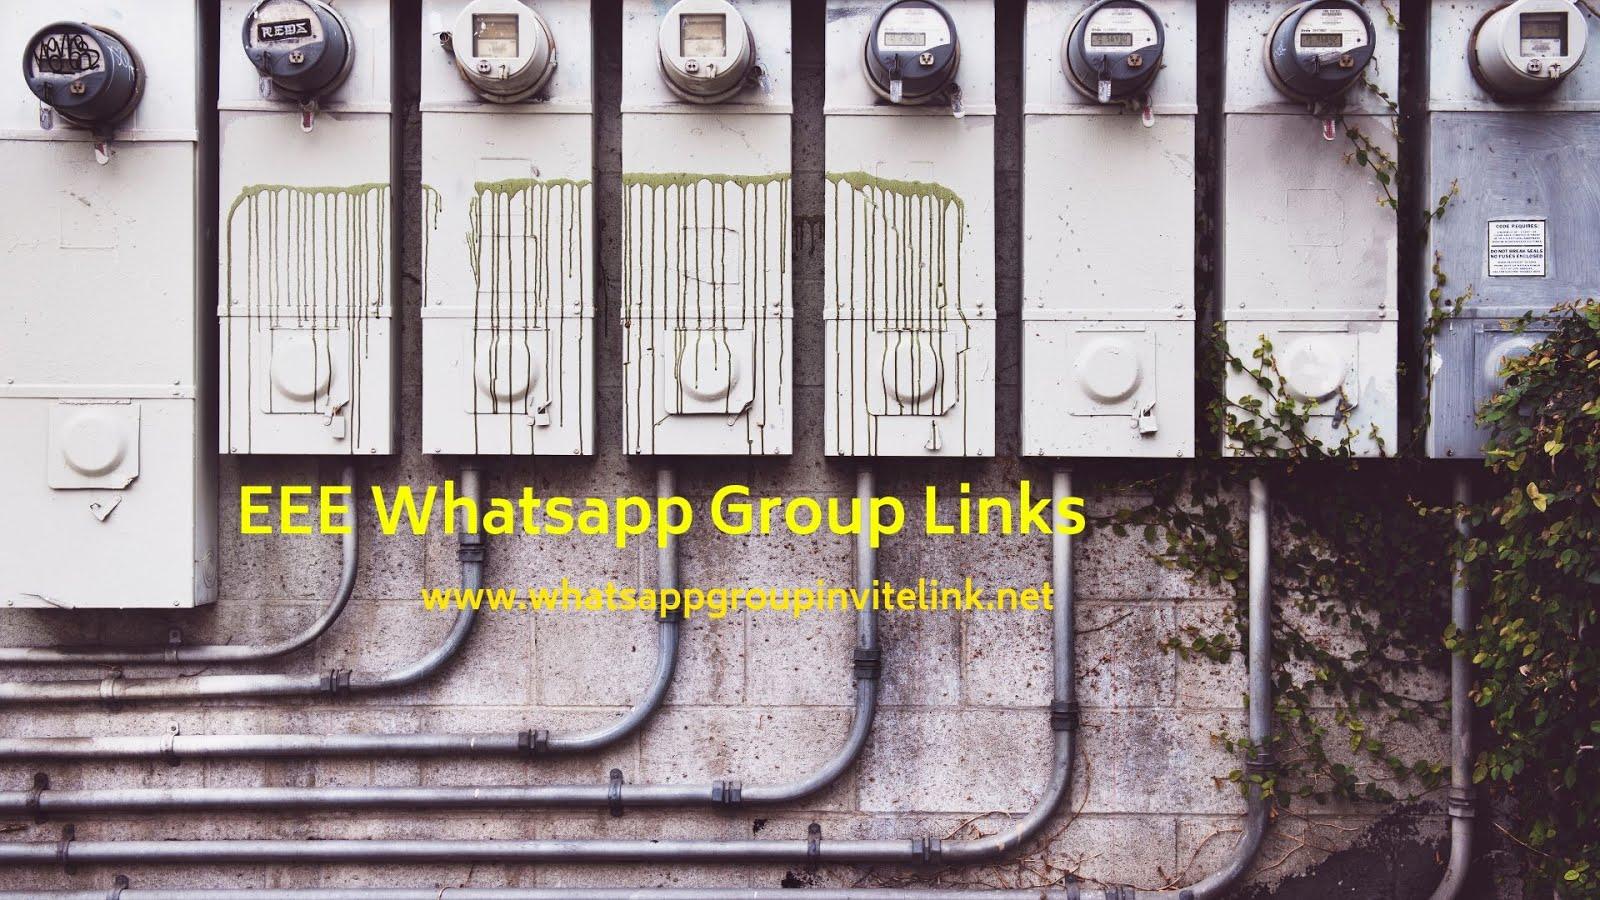 Whatsapp Group Invite Links: EEE Whatsapp Group Links